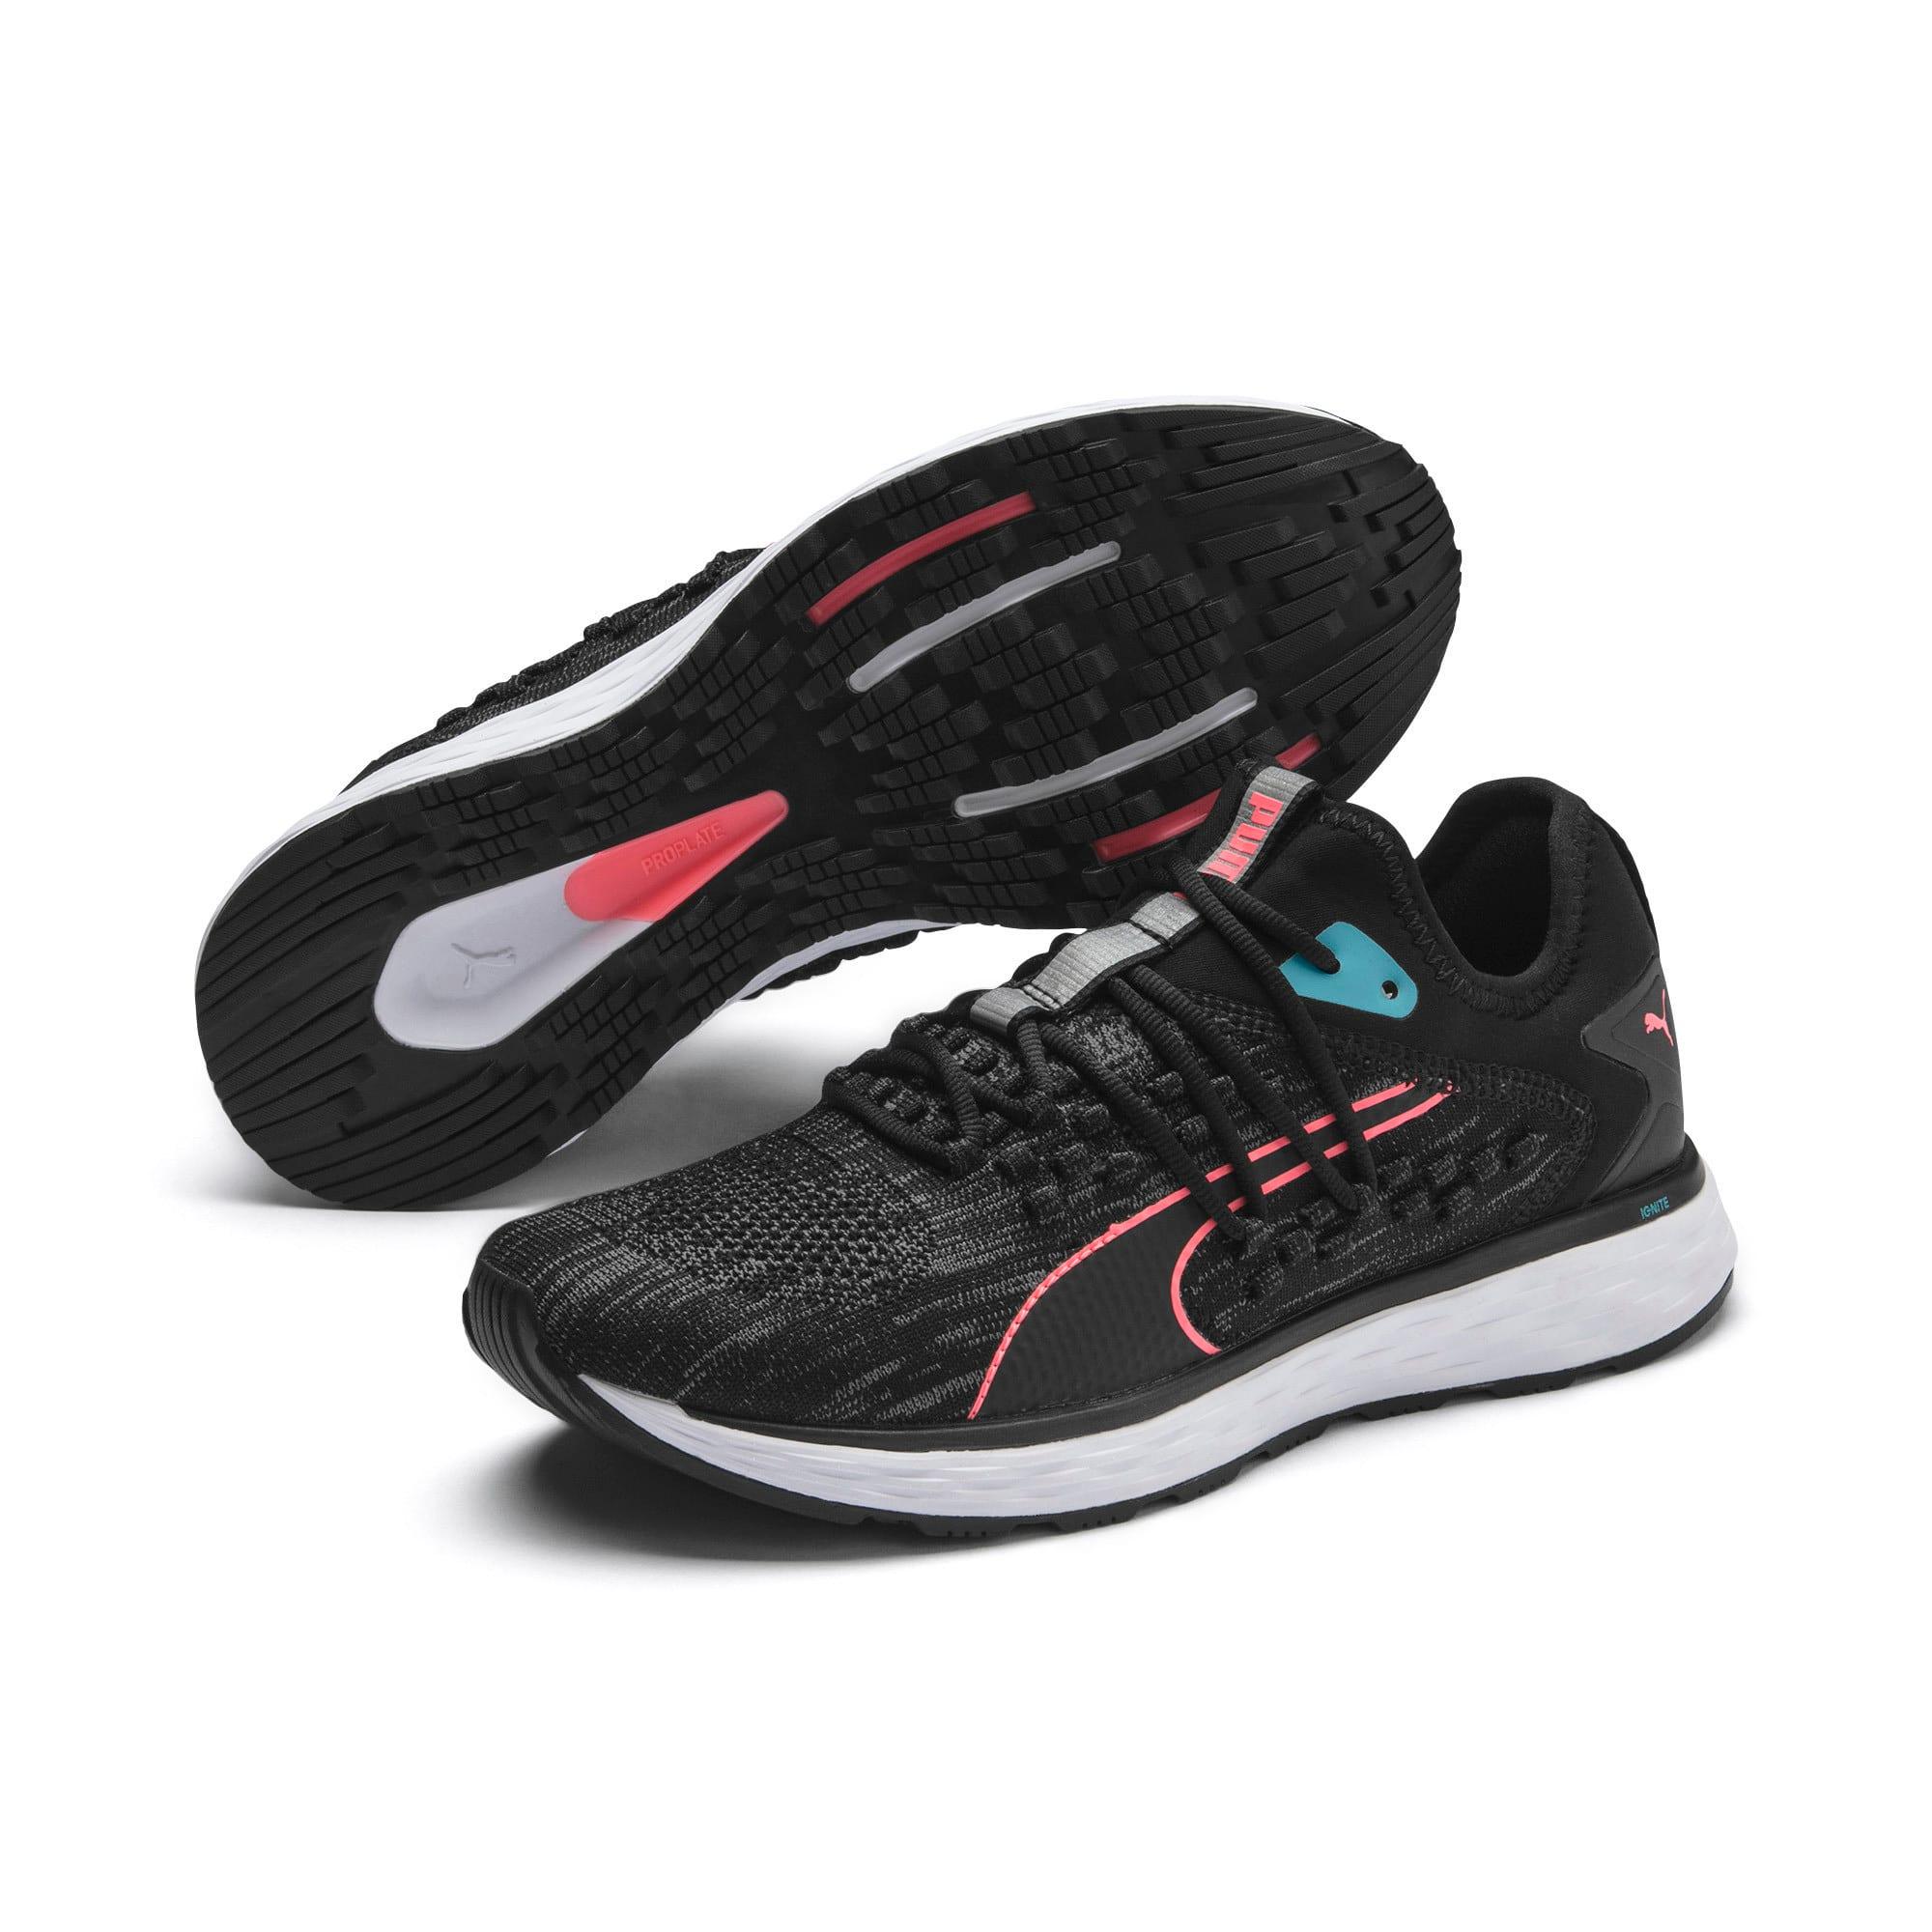 Thumbnail 3 of SPEED 600 FUSEFIT Women's Running Shoes, Puma Black-Milky Blue, medium